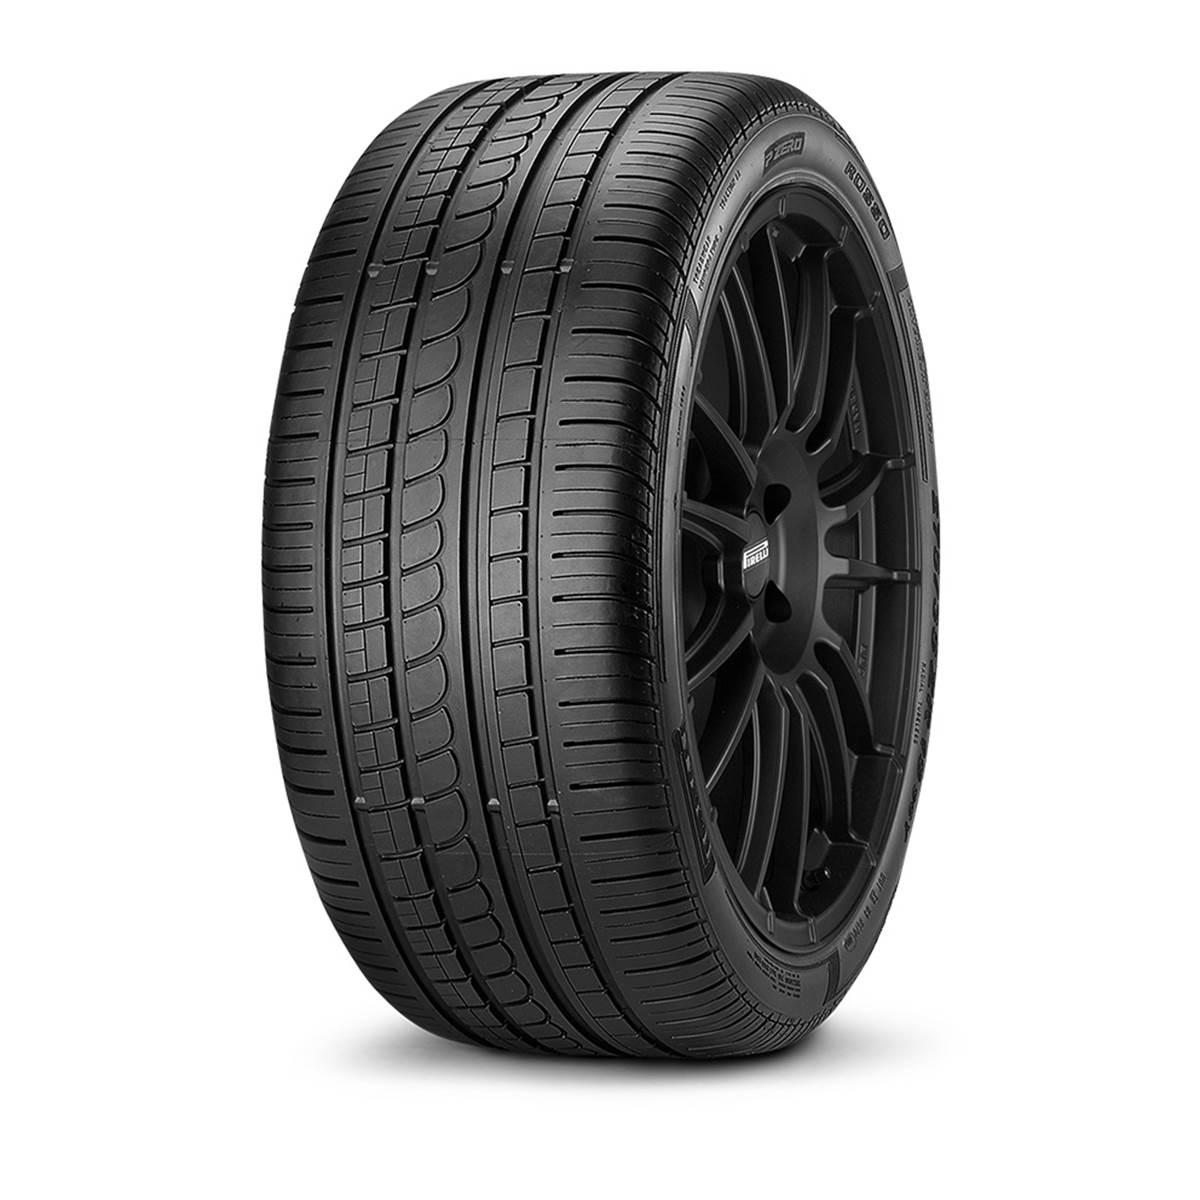 Pneu Pirelli 225/40R18 88Y Pzero Rosso Asimmetrico